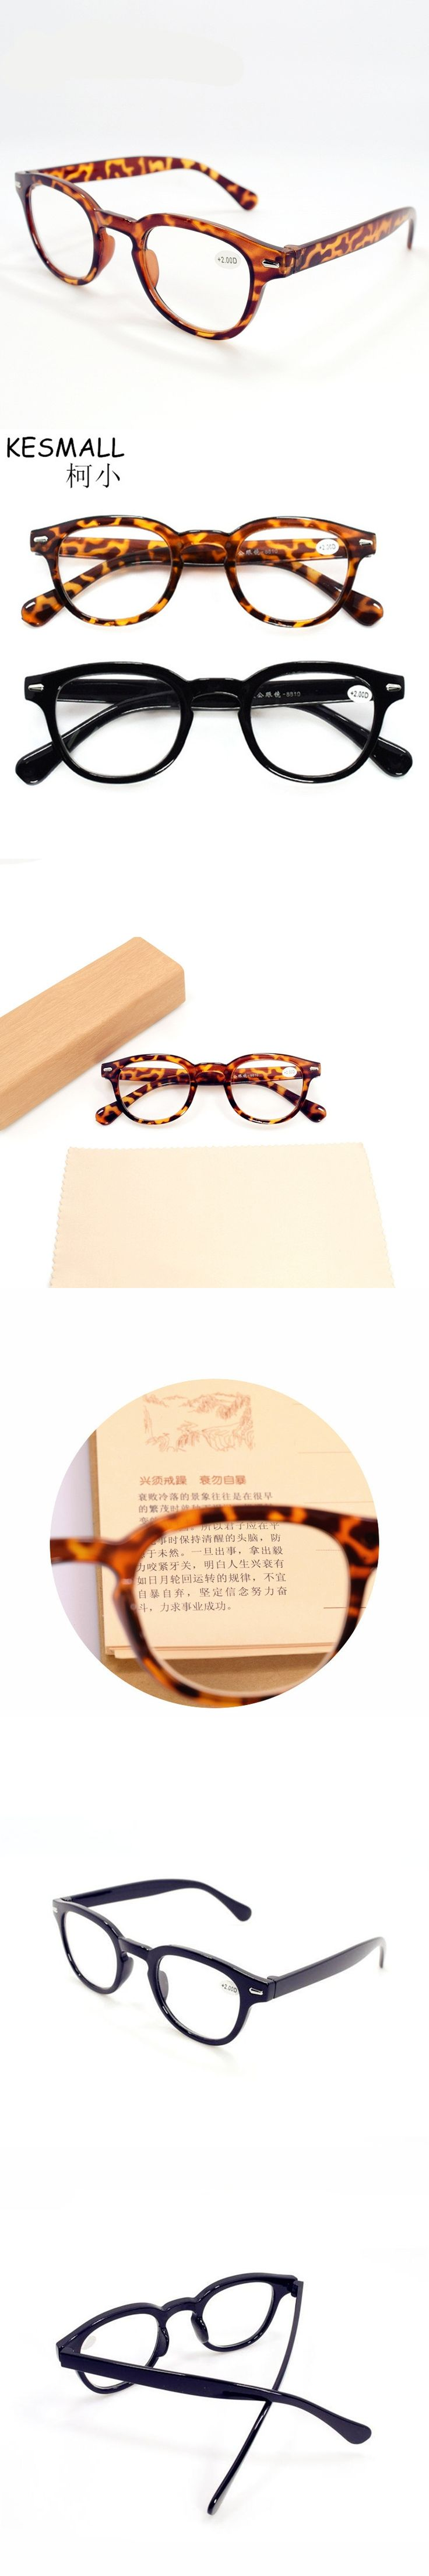 Fashion Reading Glasses Women Men Eyeglasses Black Leopard Frame Reader Glasses Oculos de Grau Old People Reading Glasses YJ798